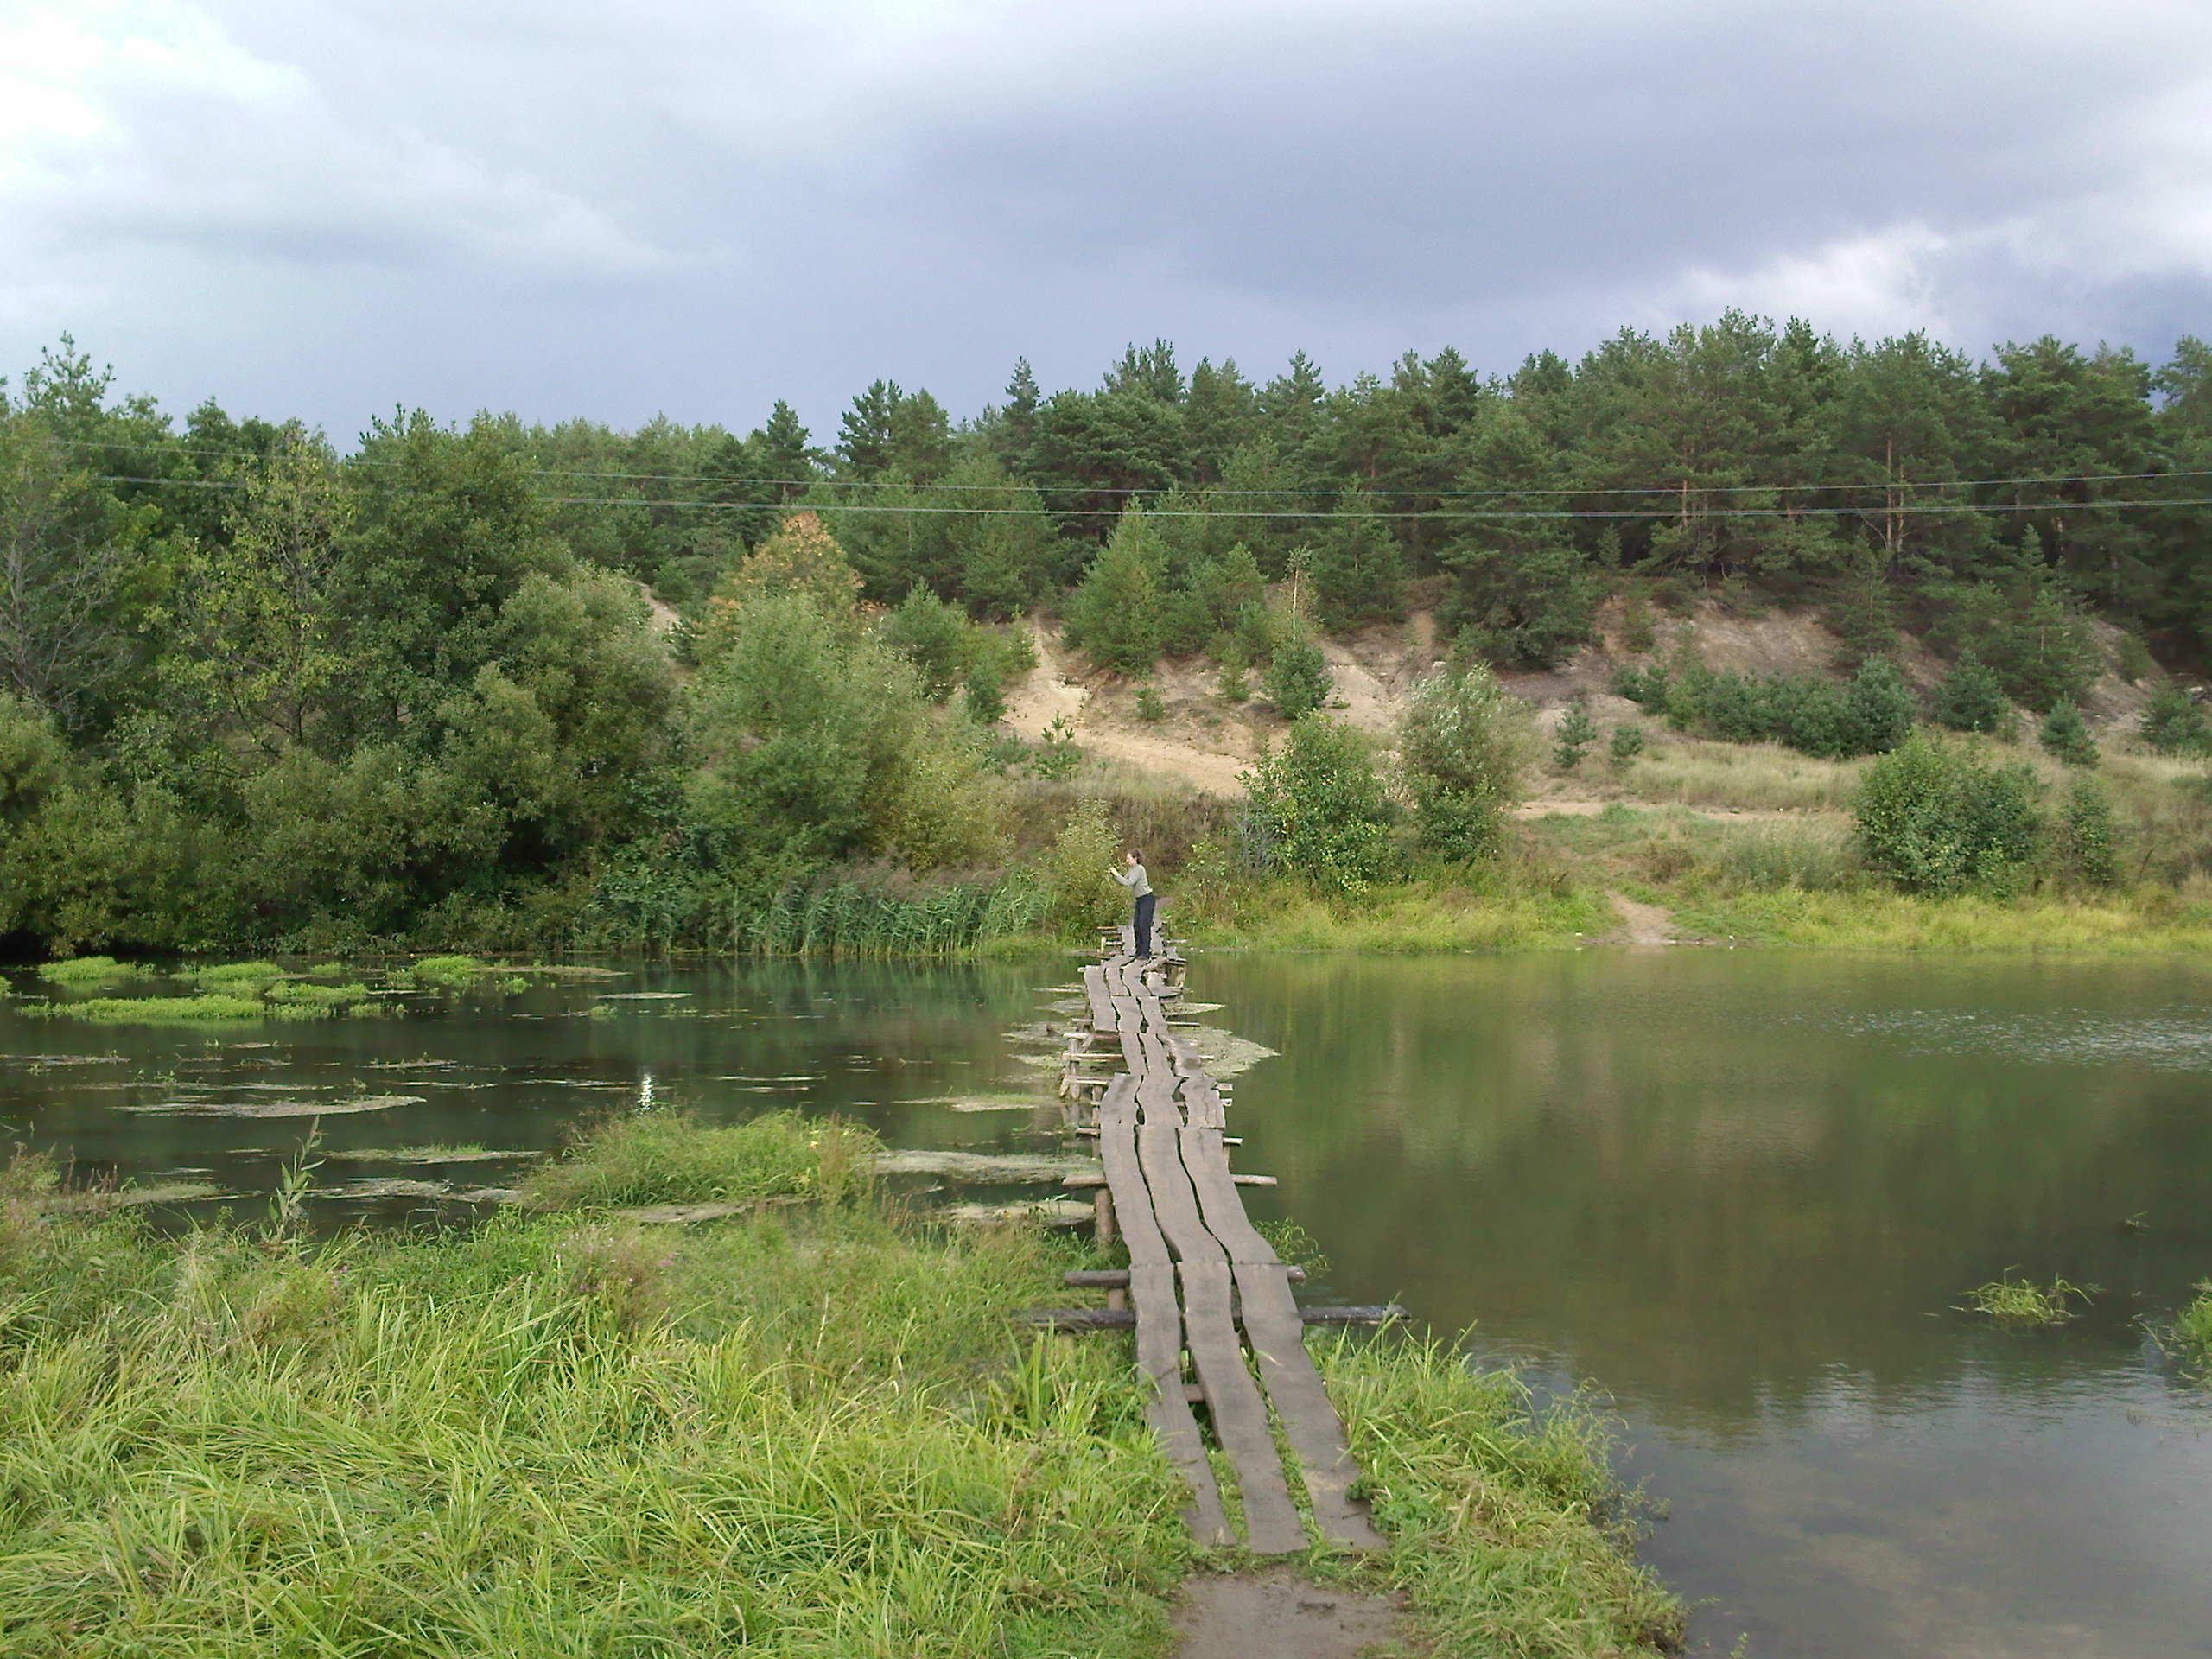 Russian Village: On the wooden bridge